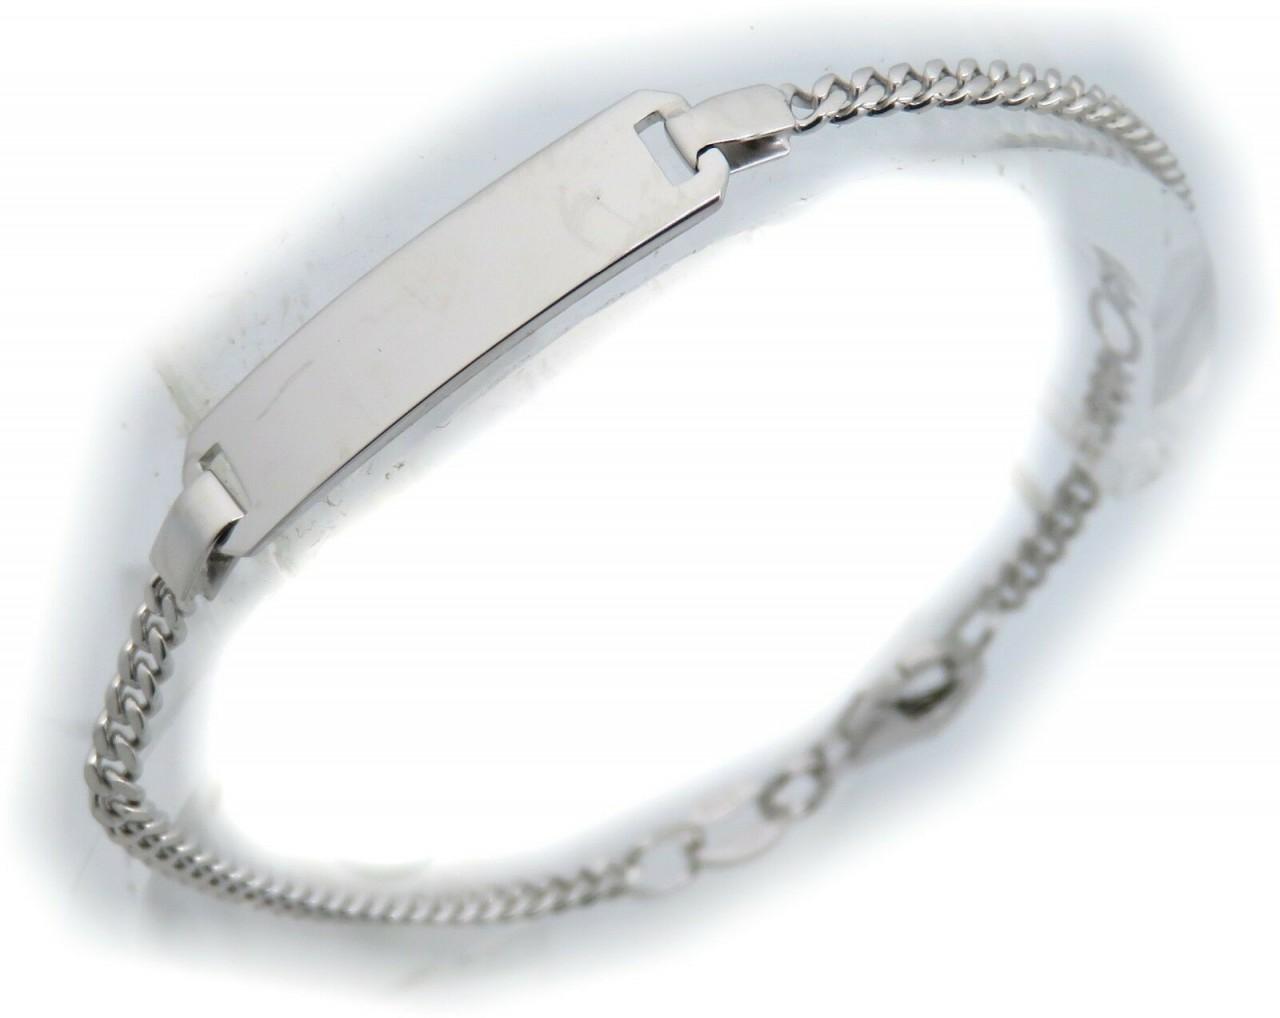 Kinderarmband Panzerkette 12-14 cm incl. Gravur echt Silber 925 Armband Neu Top